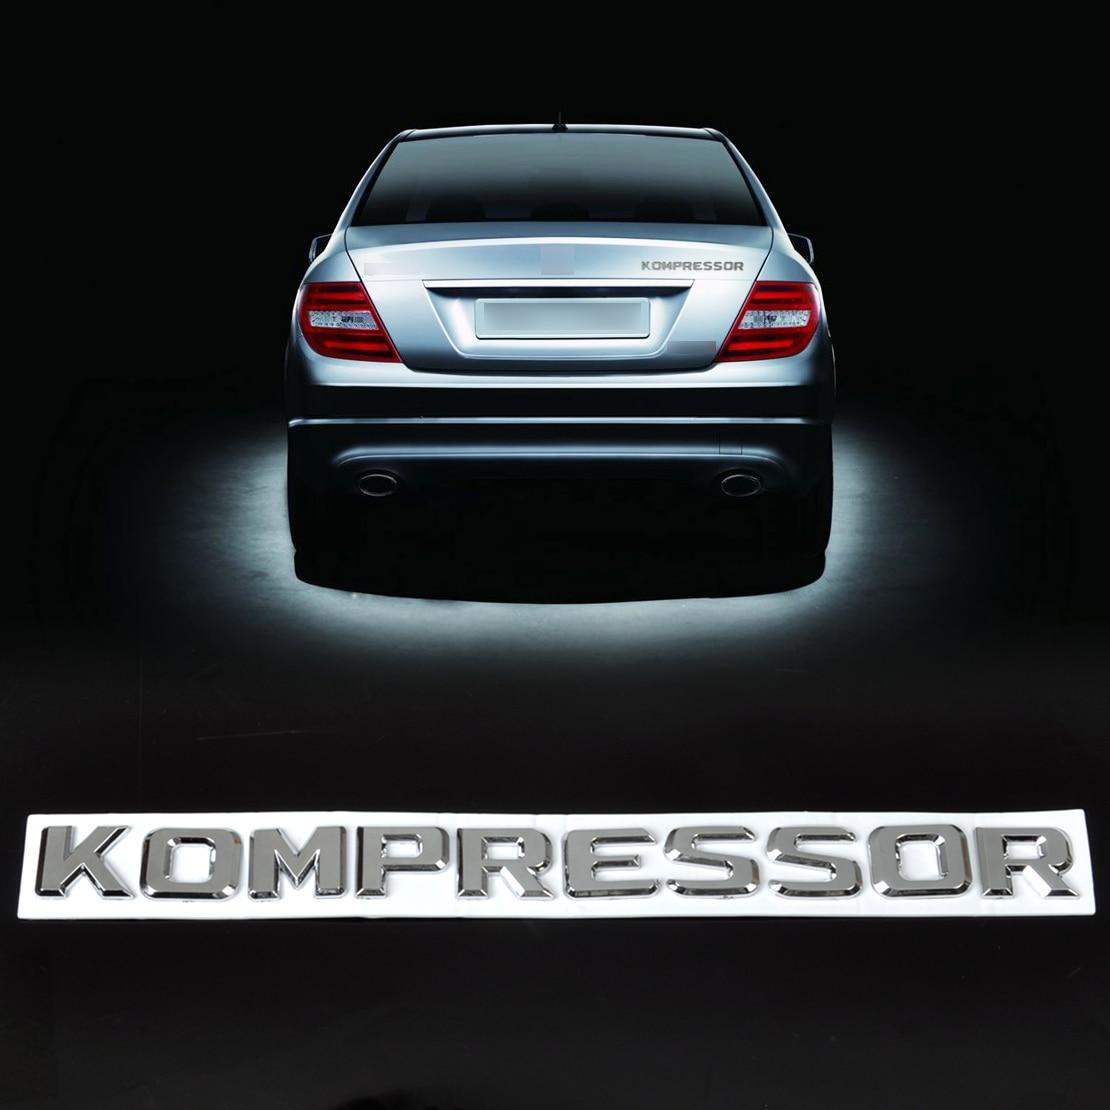 Mercedes W202 W203 W210 W170 C230 E300D SLK230 Engine Motor Mount NEW